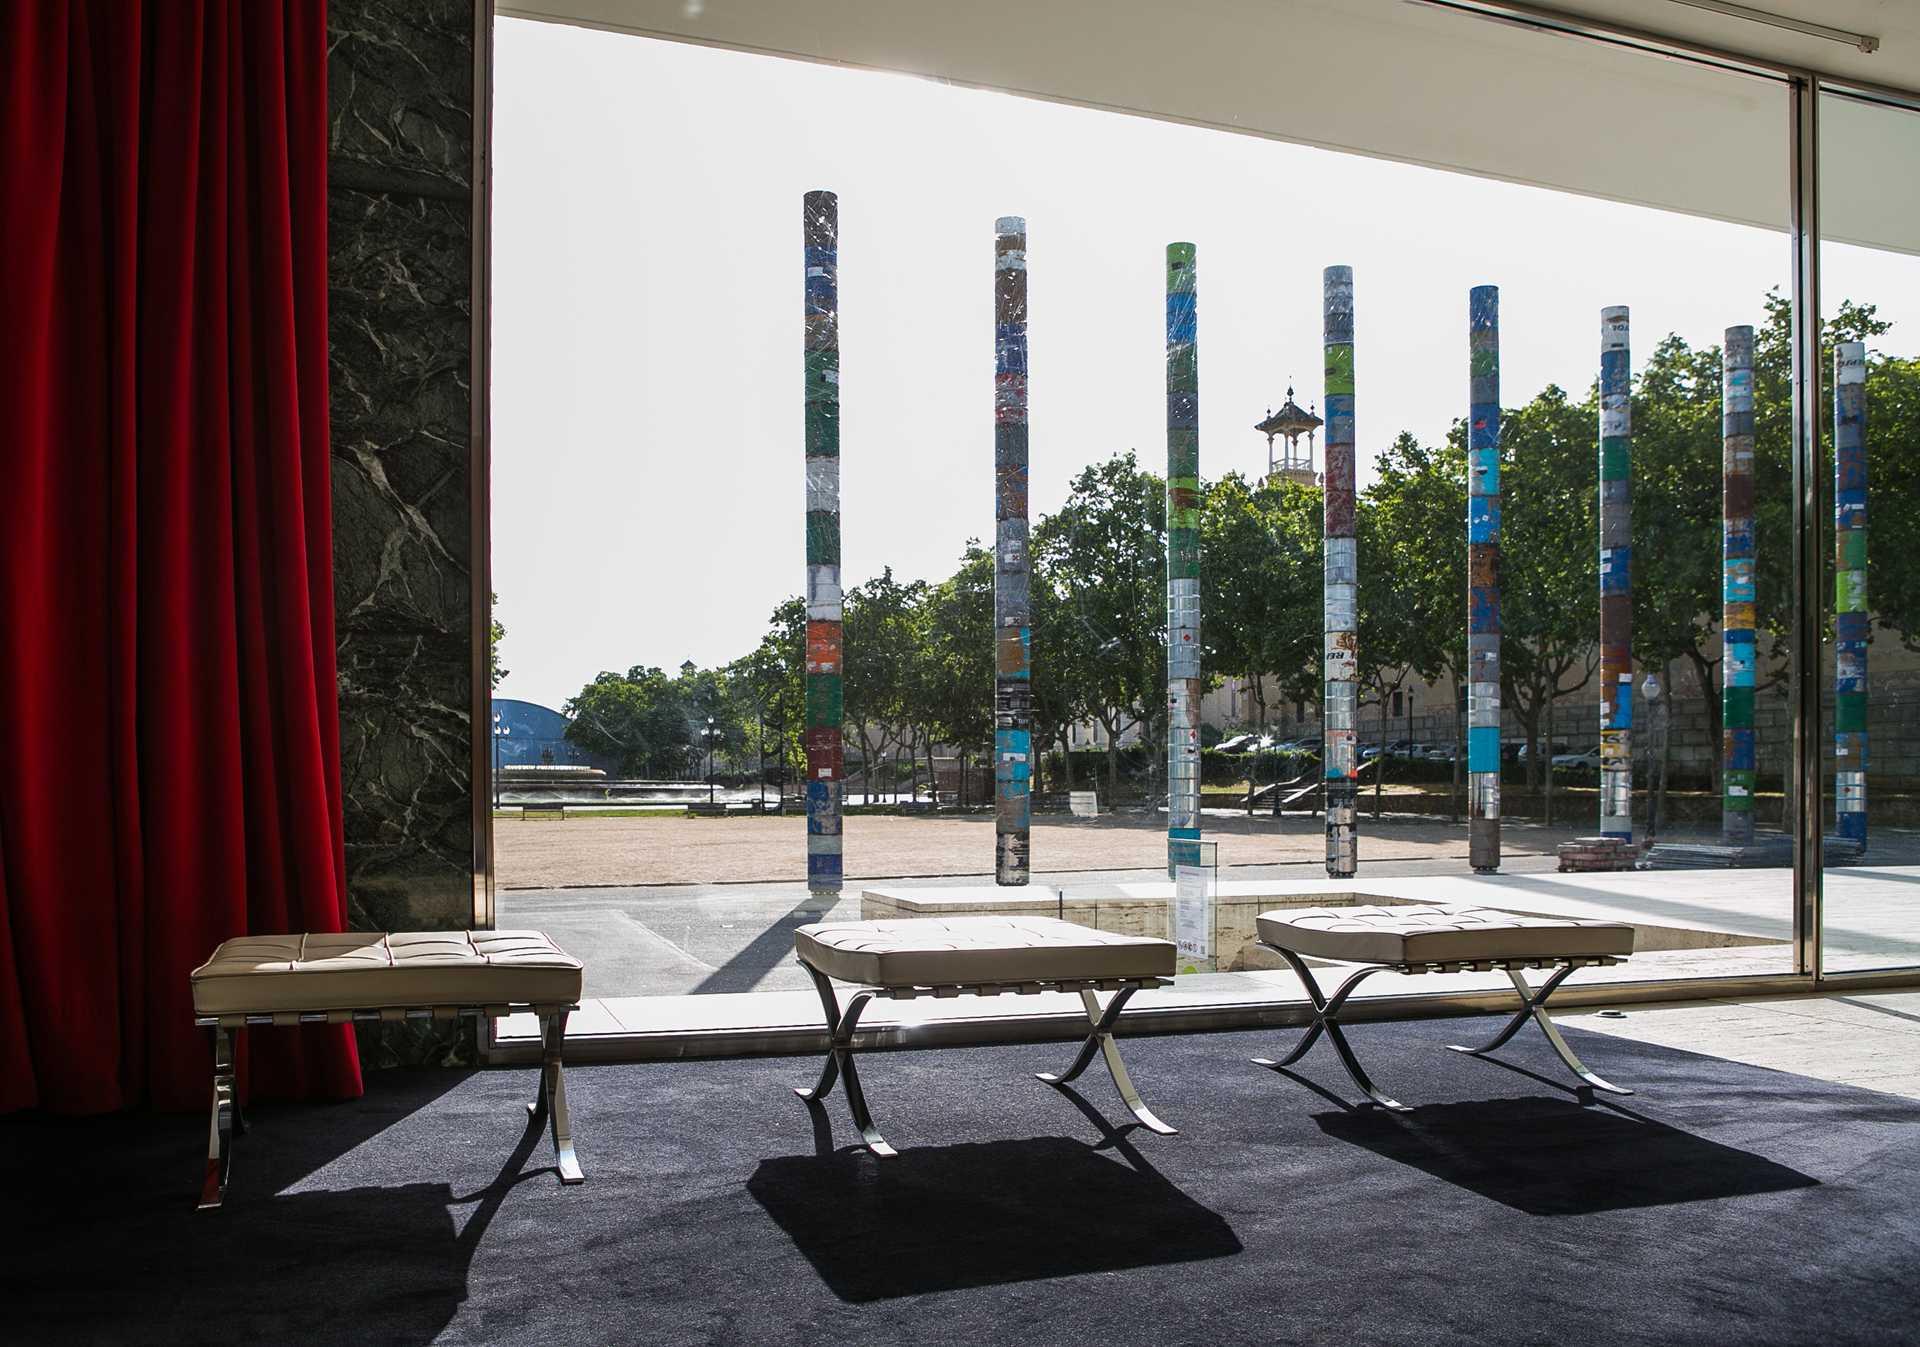 Conmemorative columns Barcelona Pavilion  - 75 01 30